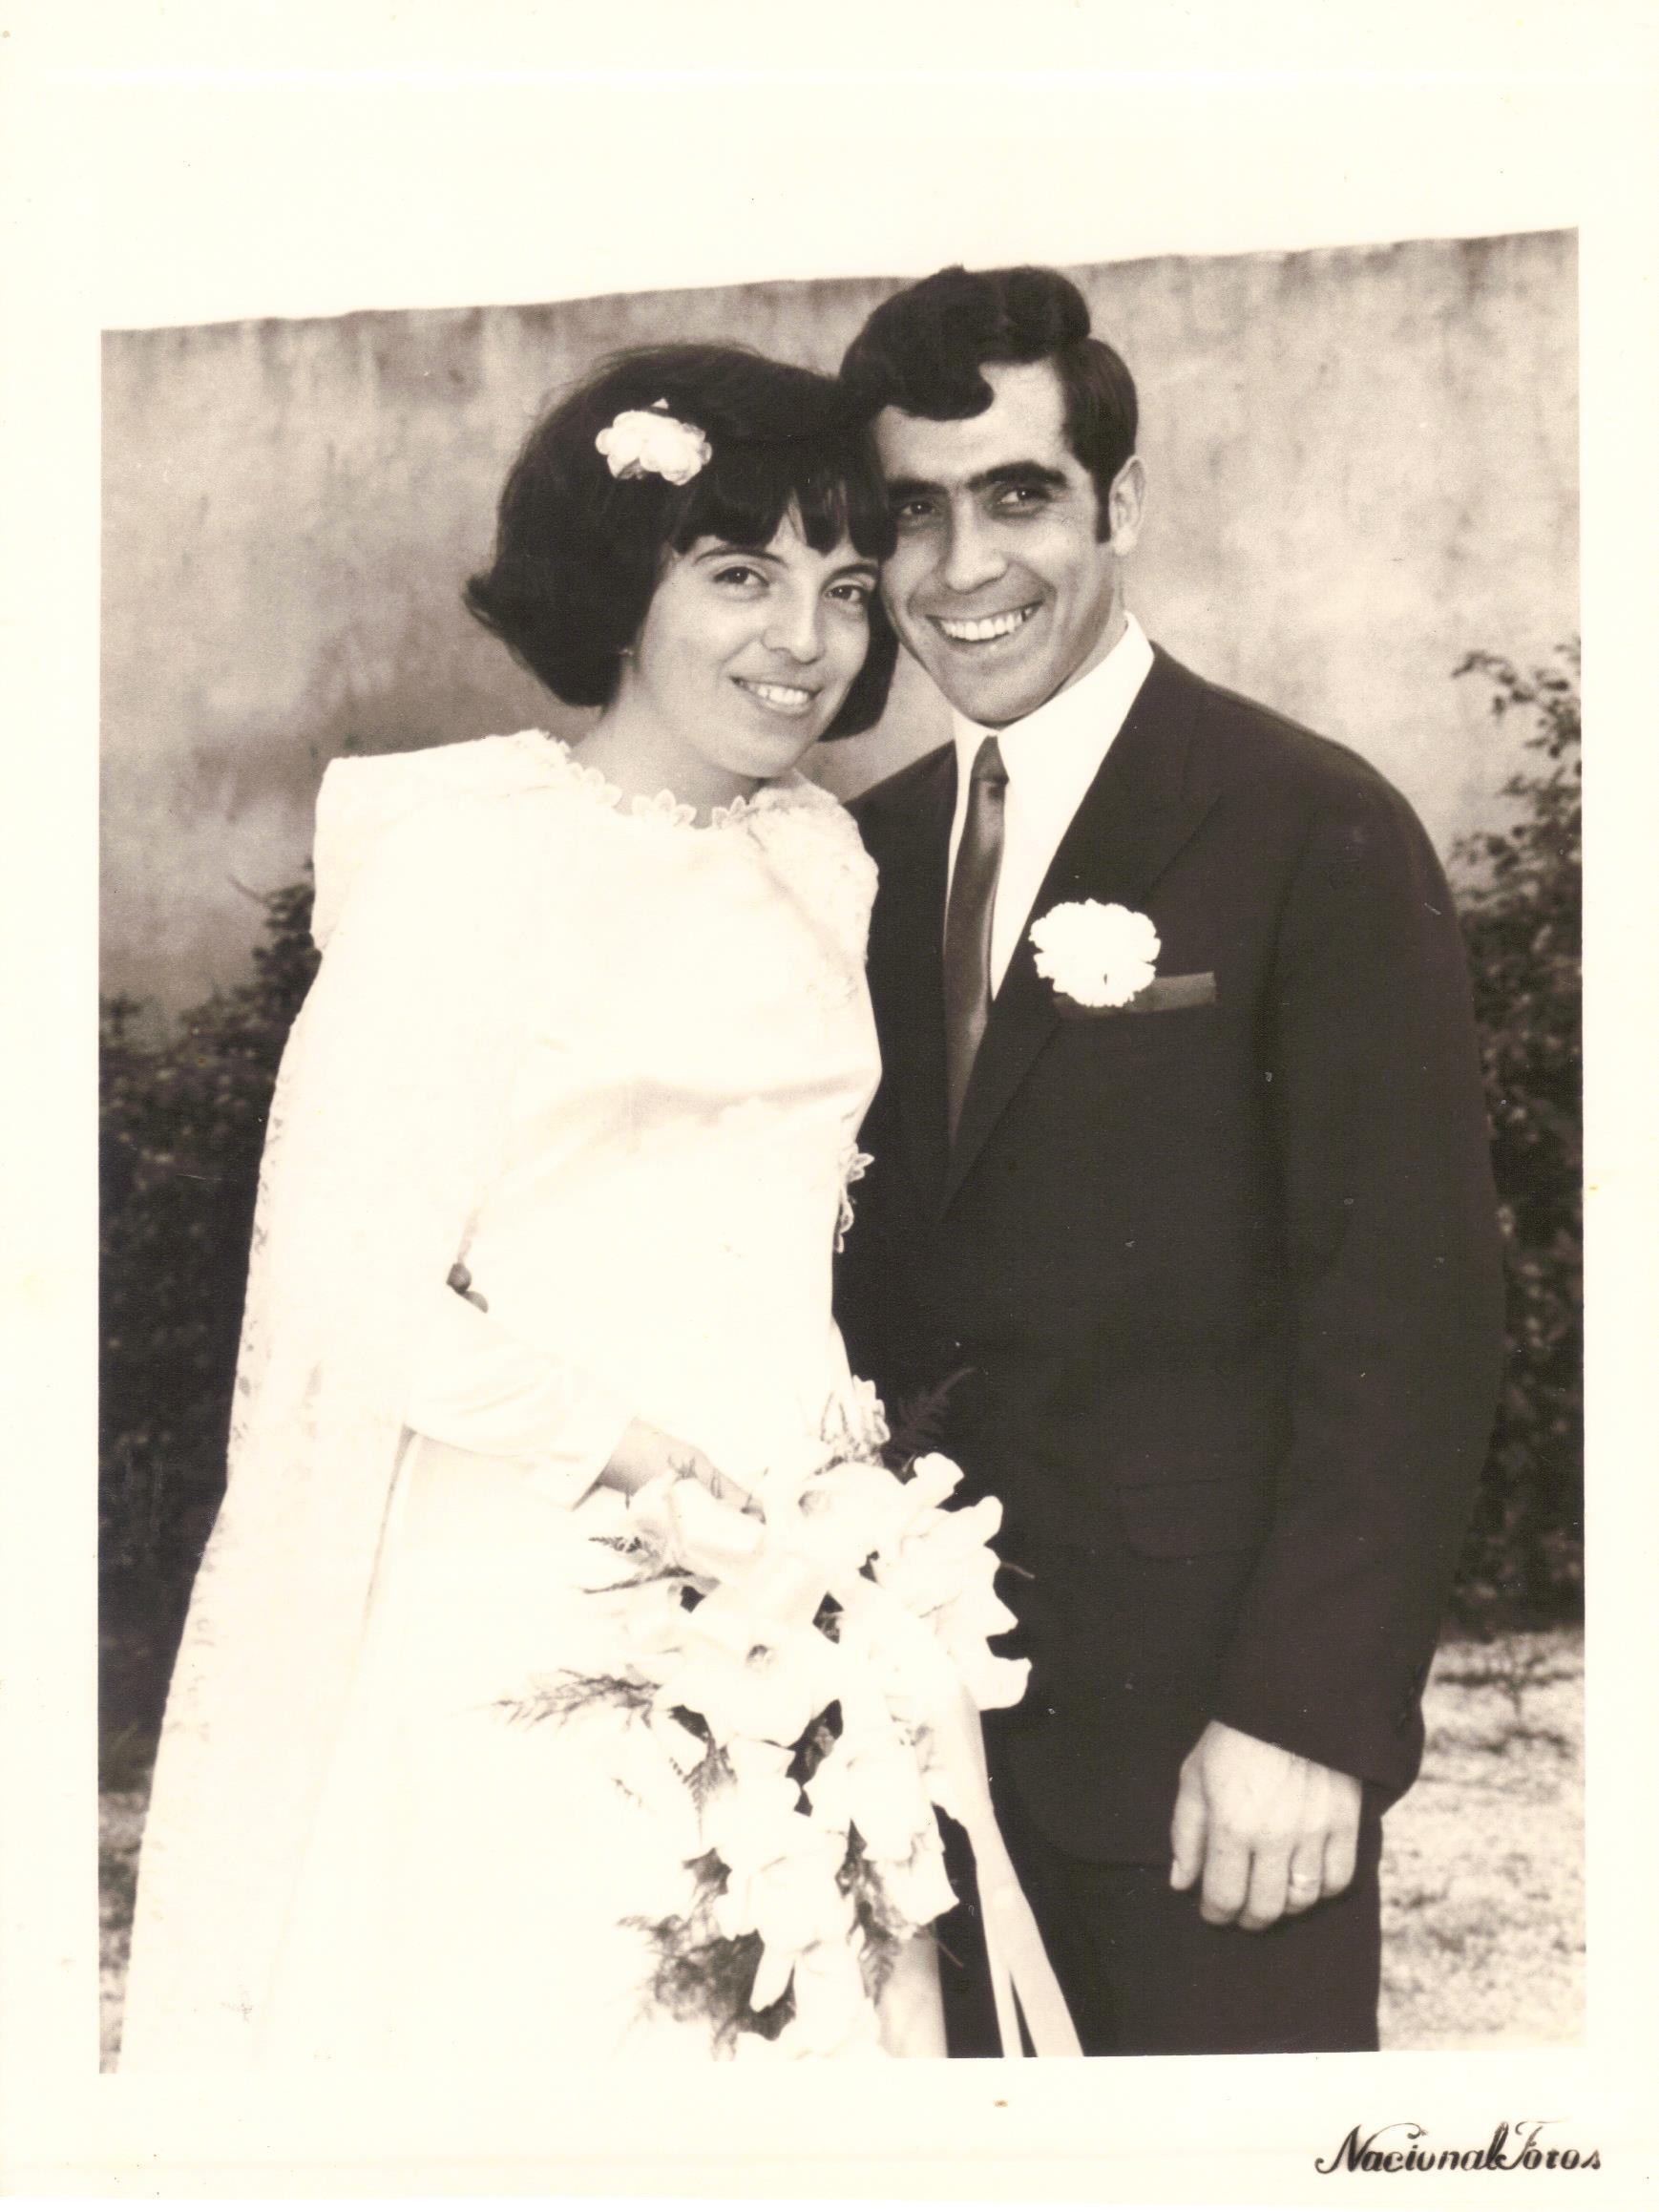 Casamento de Tiló Henriques e José Henriques, no Domingo, 12 de Outubro de 1969